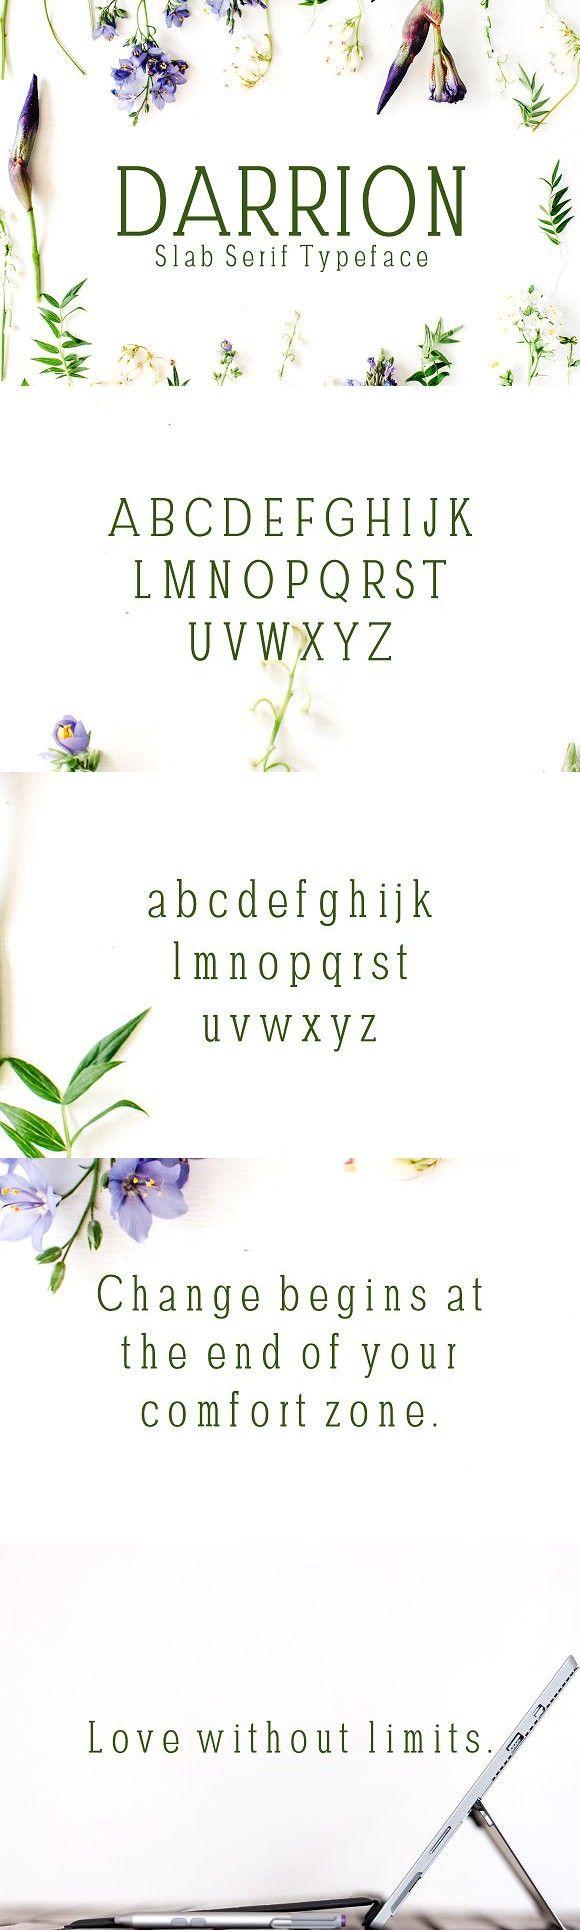 Darrion Slab Serif Typeface. Slab Serif Fonts